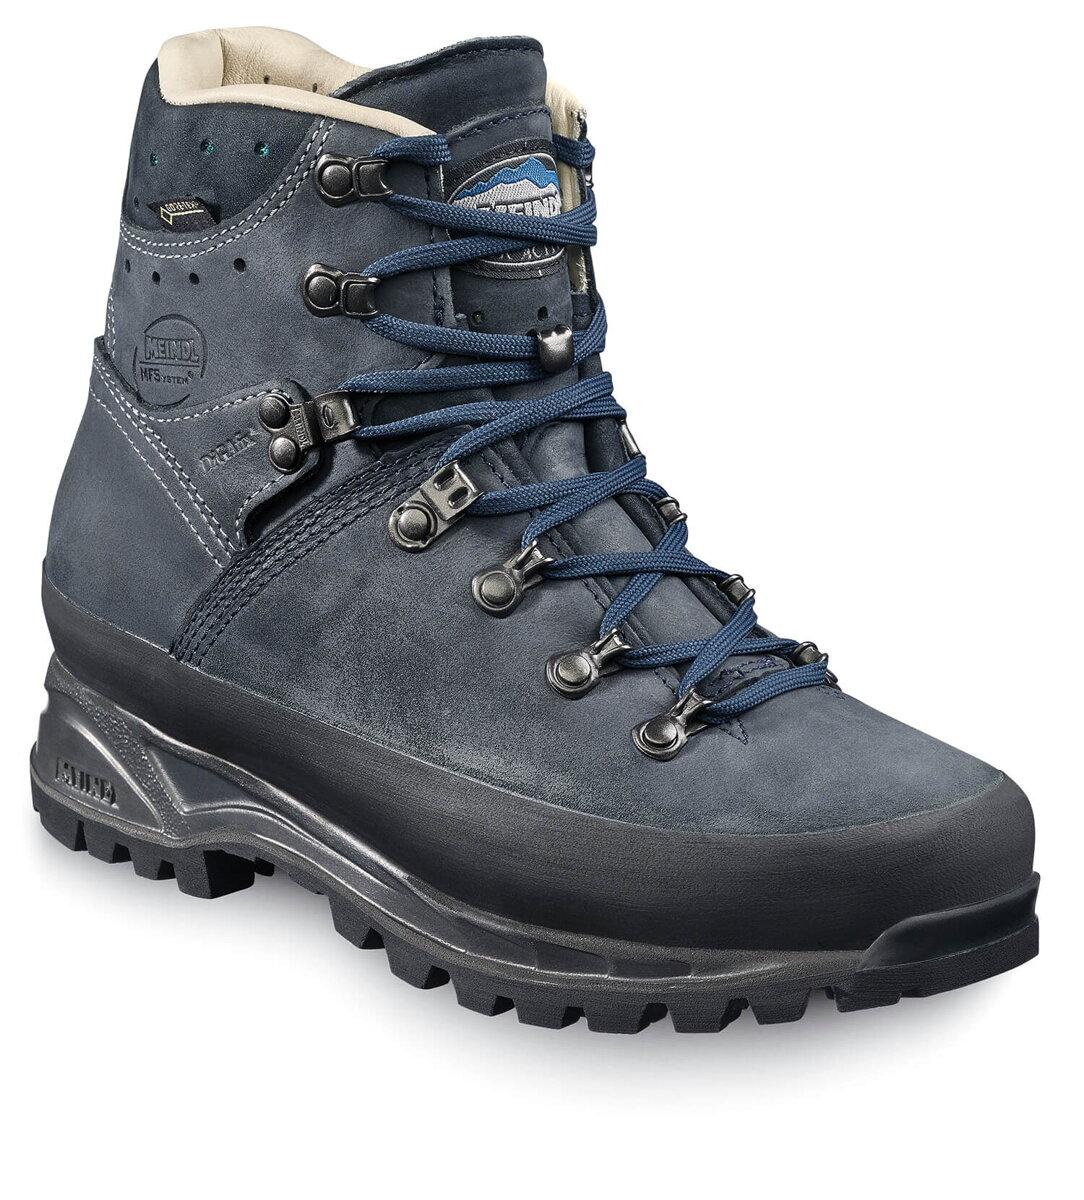 MEINDL Dámska obuv ISLAND LADY MFS ACTIVE modré alebo hnedé f08a1b83867